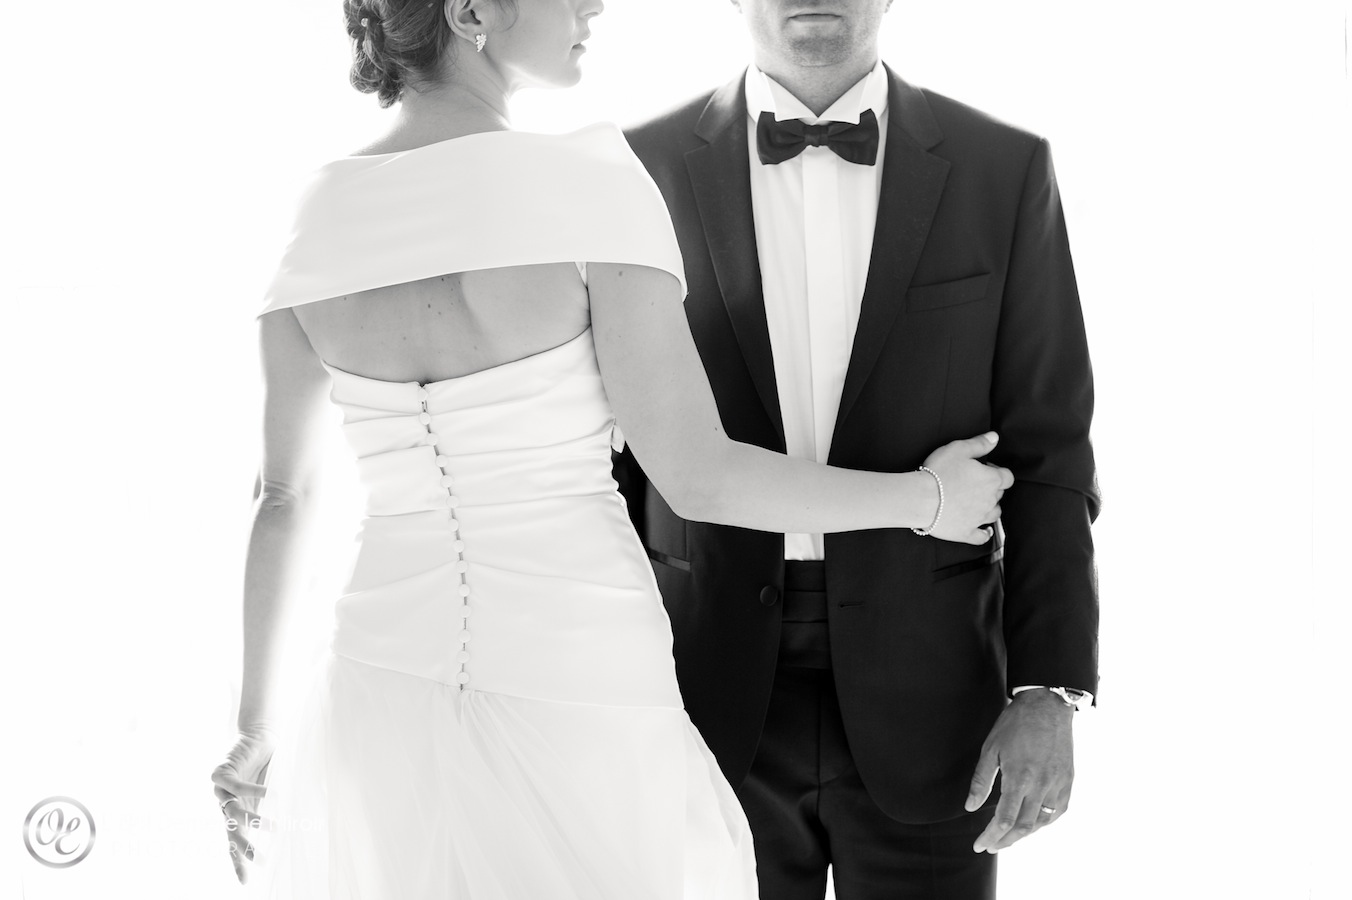 Photographe de mariage Alpes Maritimes